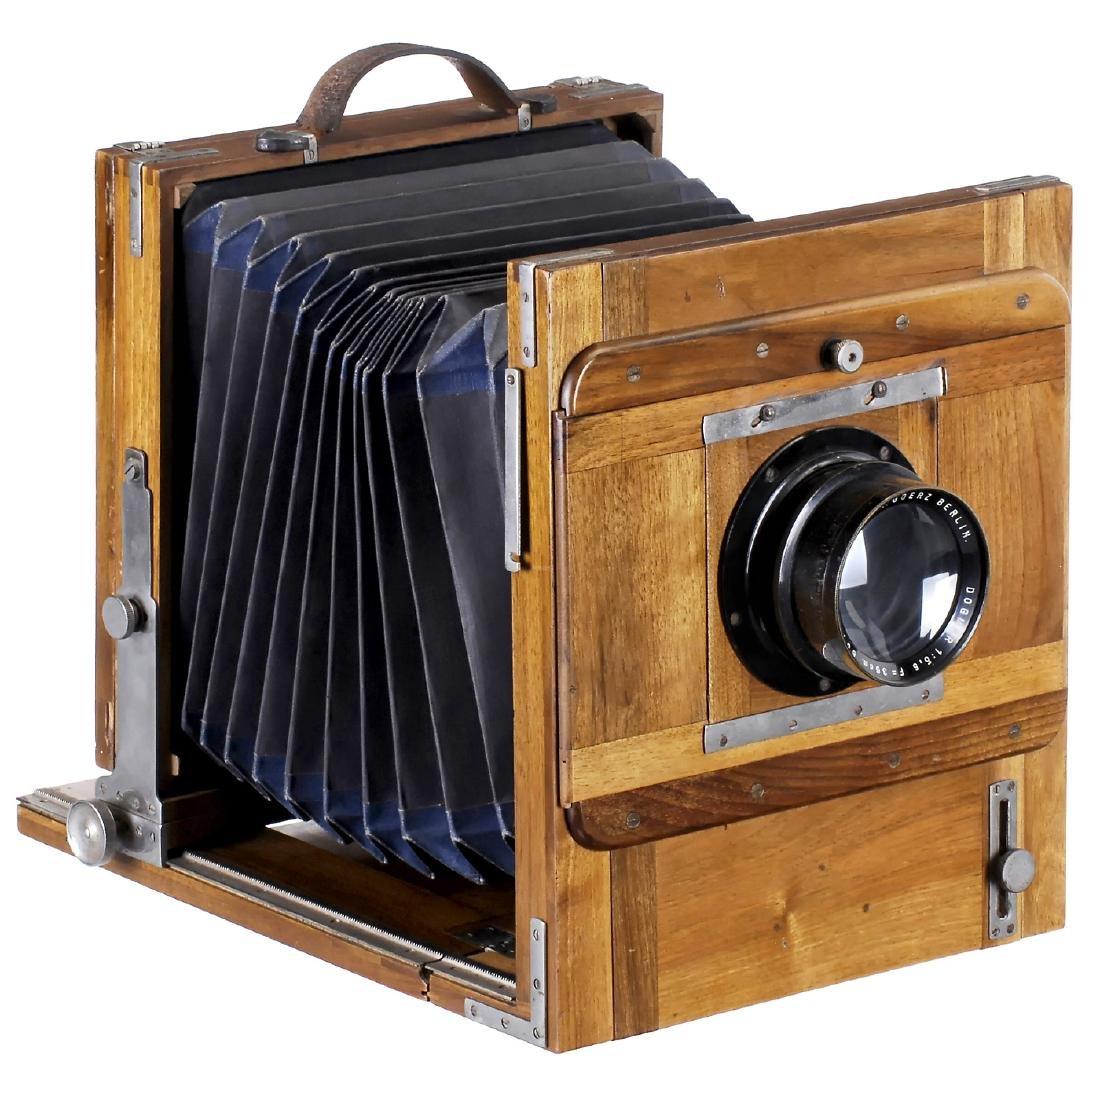 Field Camera 18 x 24 cm, c. 1900-1910